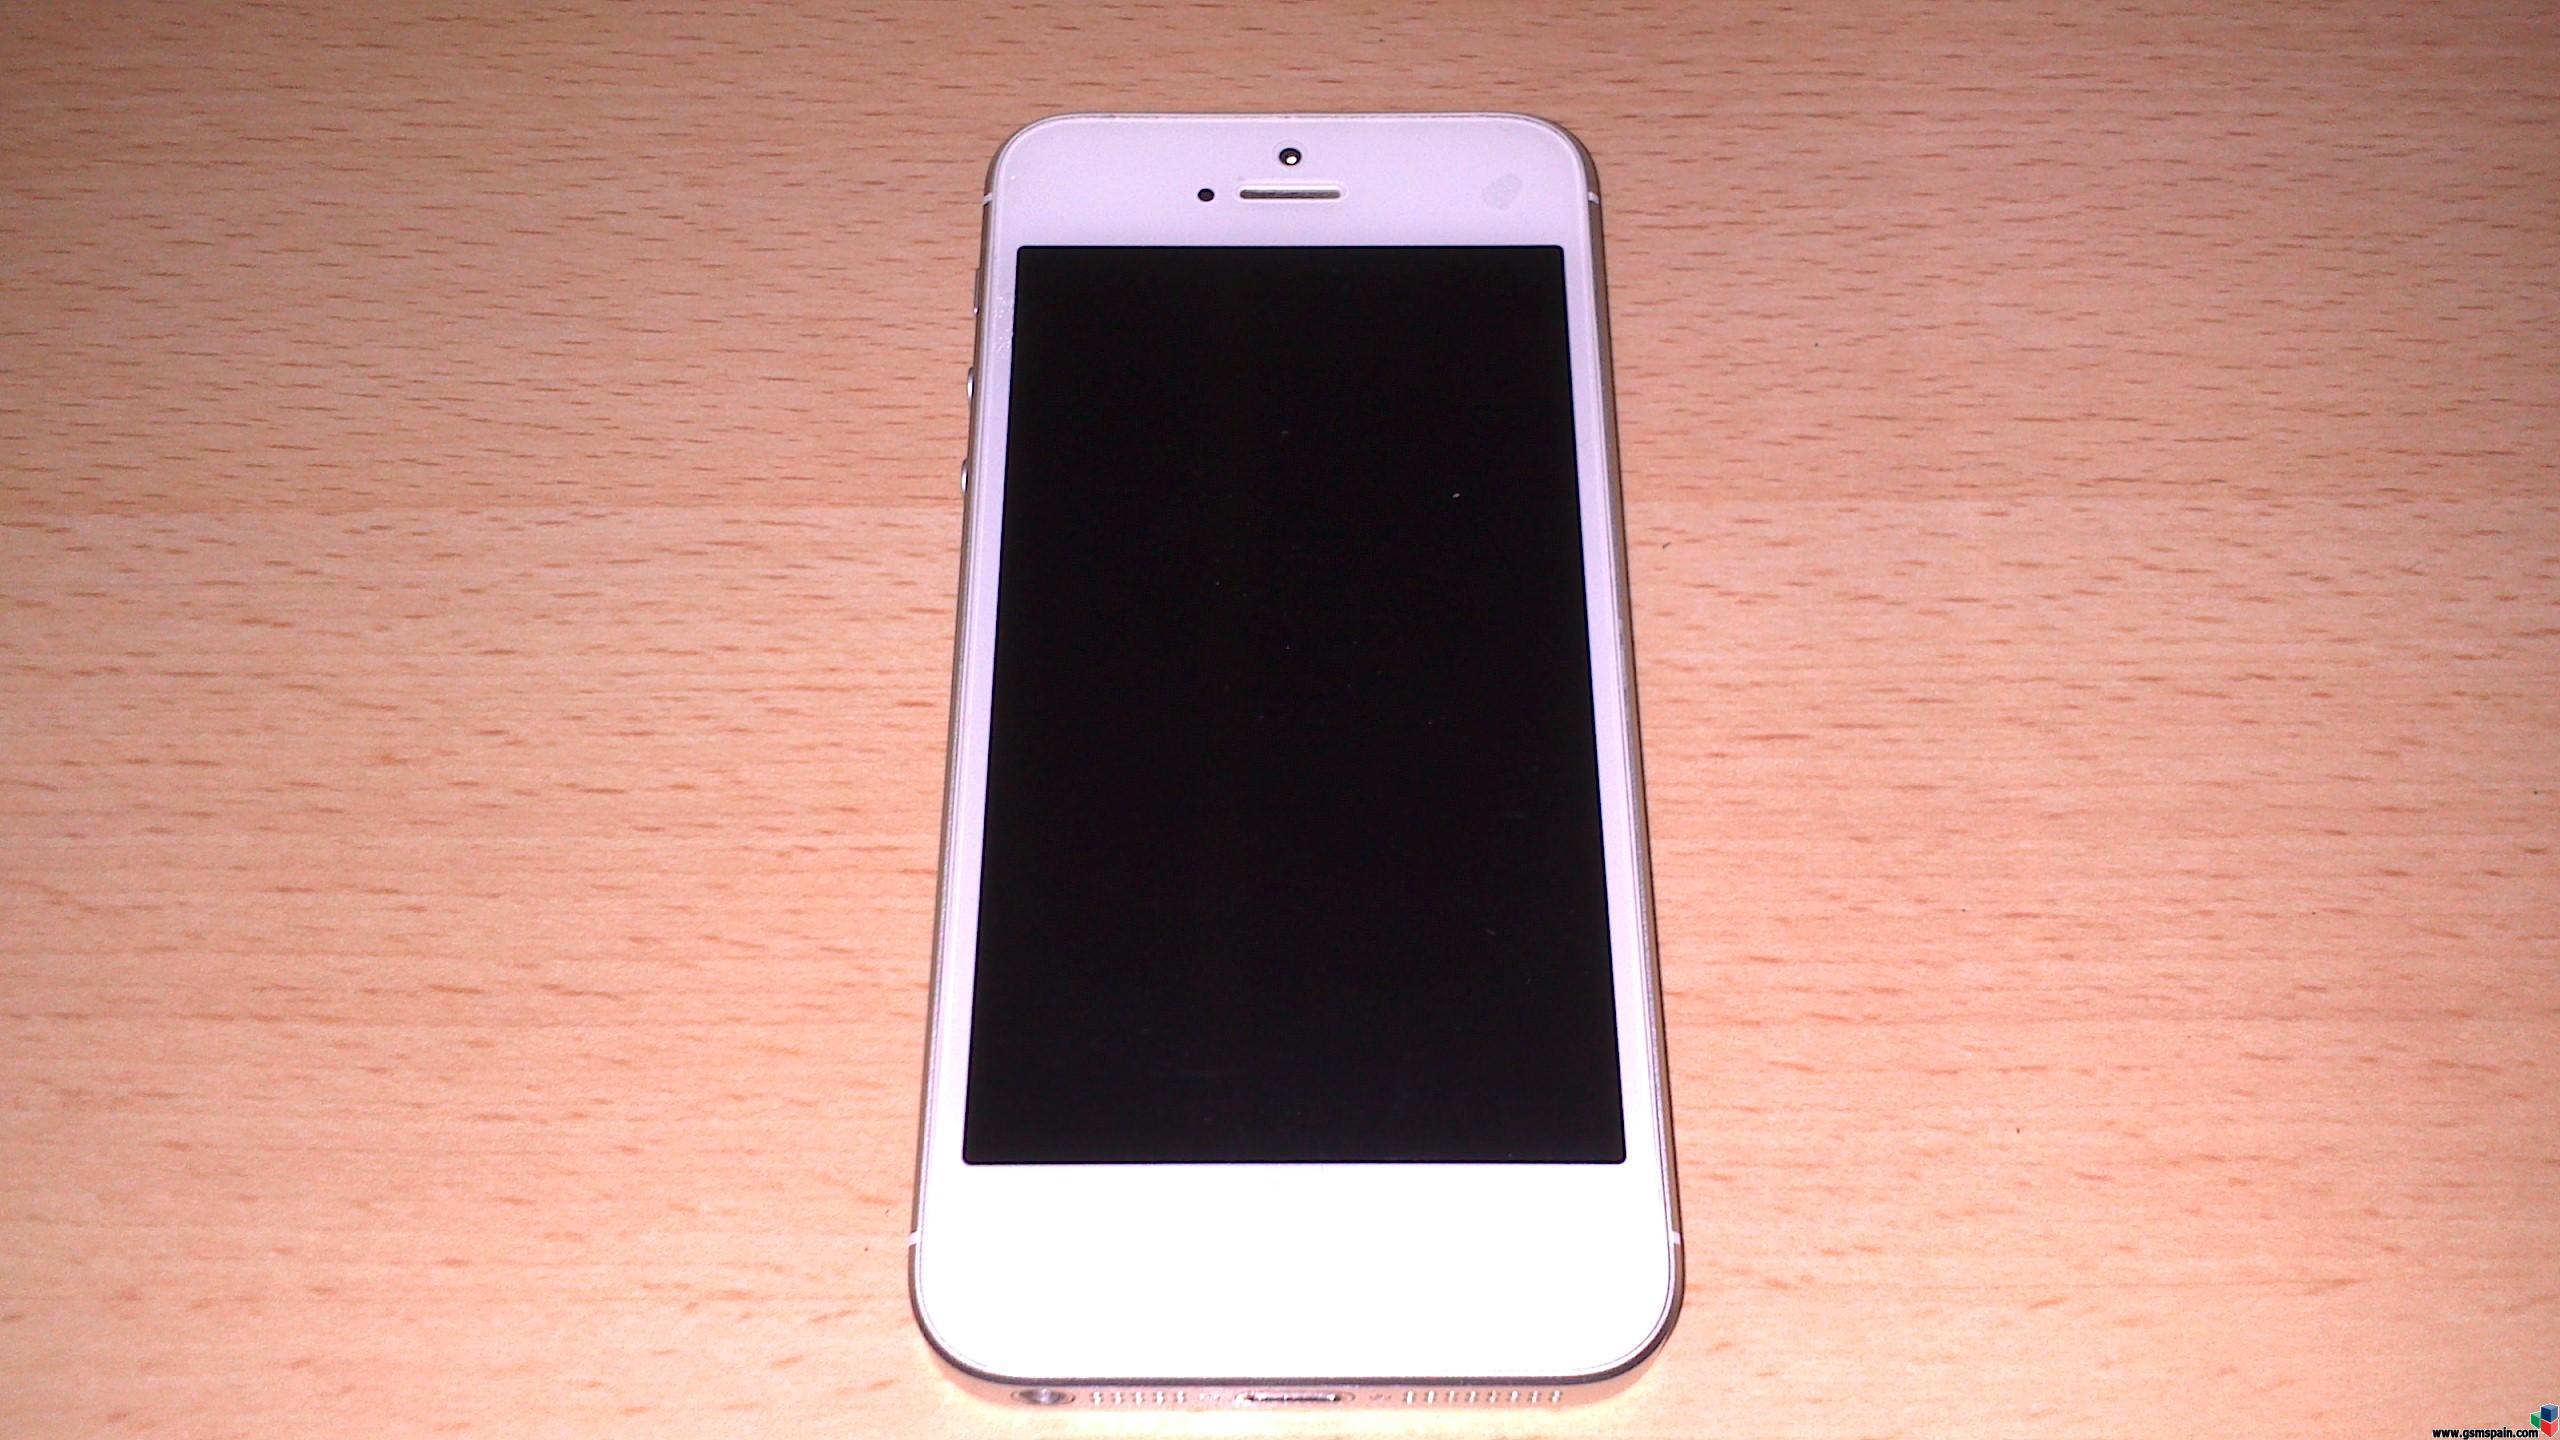 3244a91507a venta vendo iphone 5 libre blanco perfecto estado | venta segunda mano apple